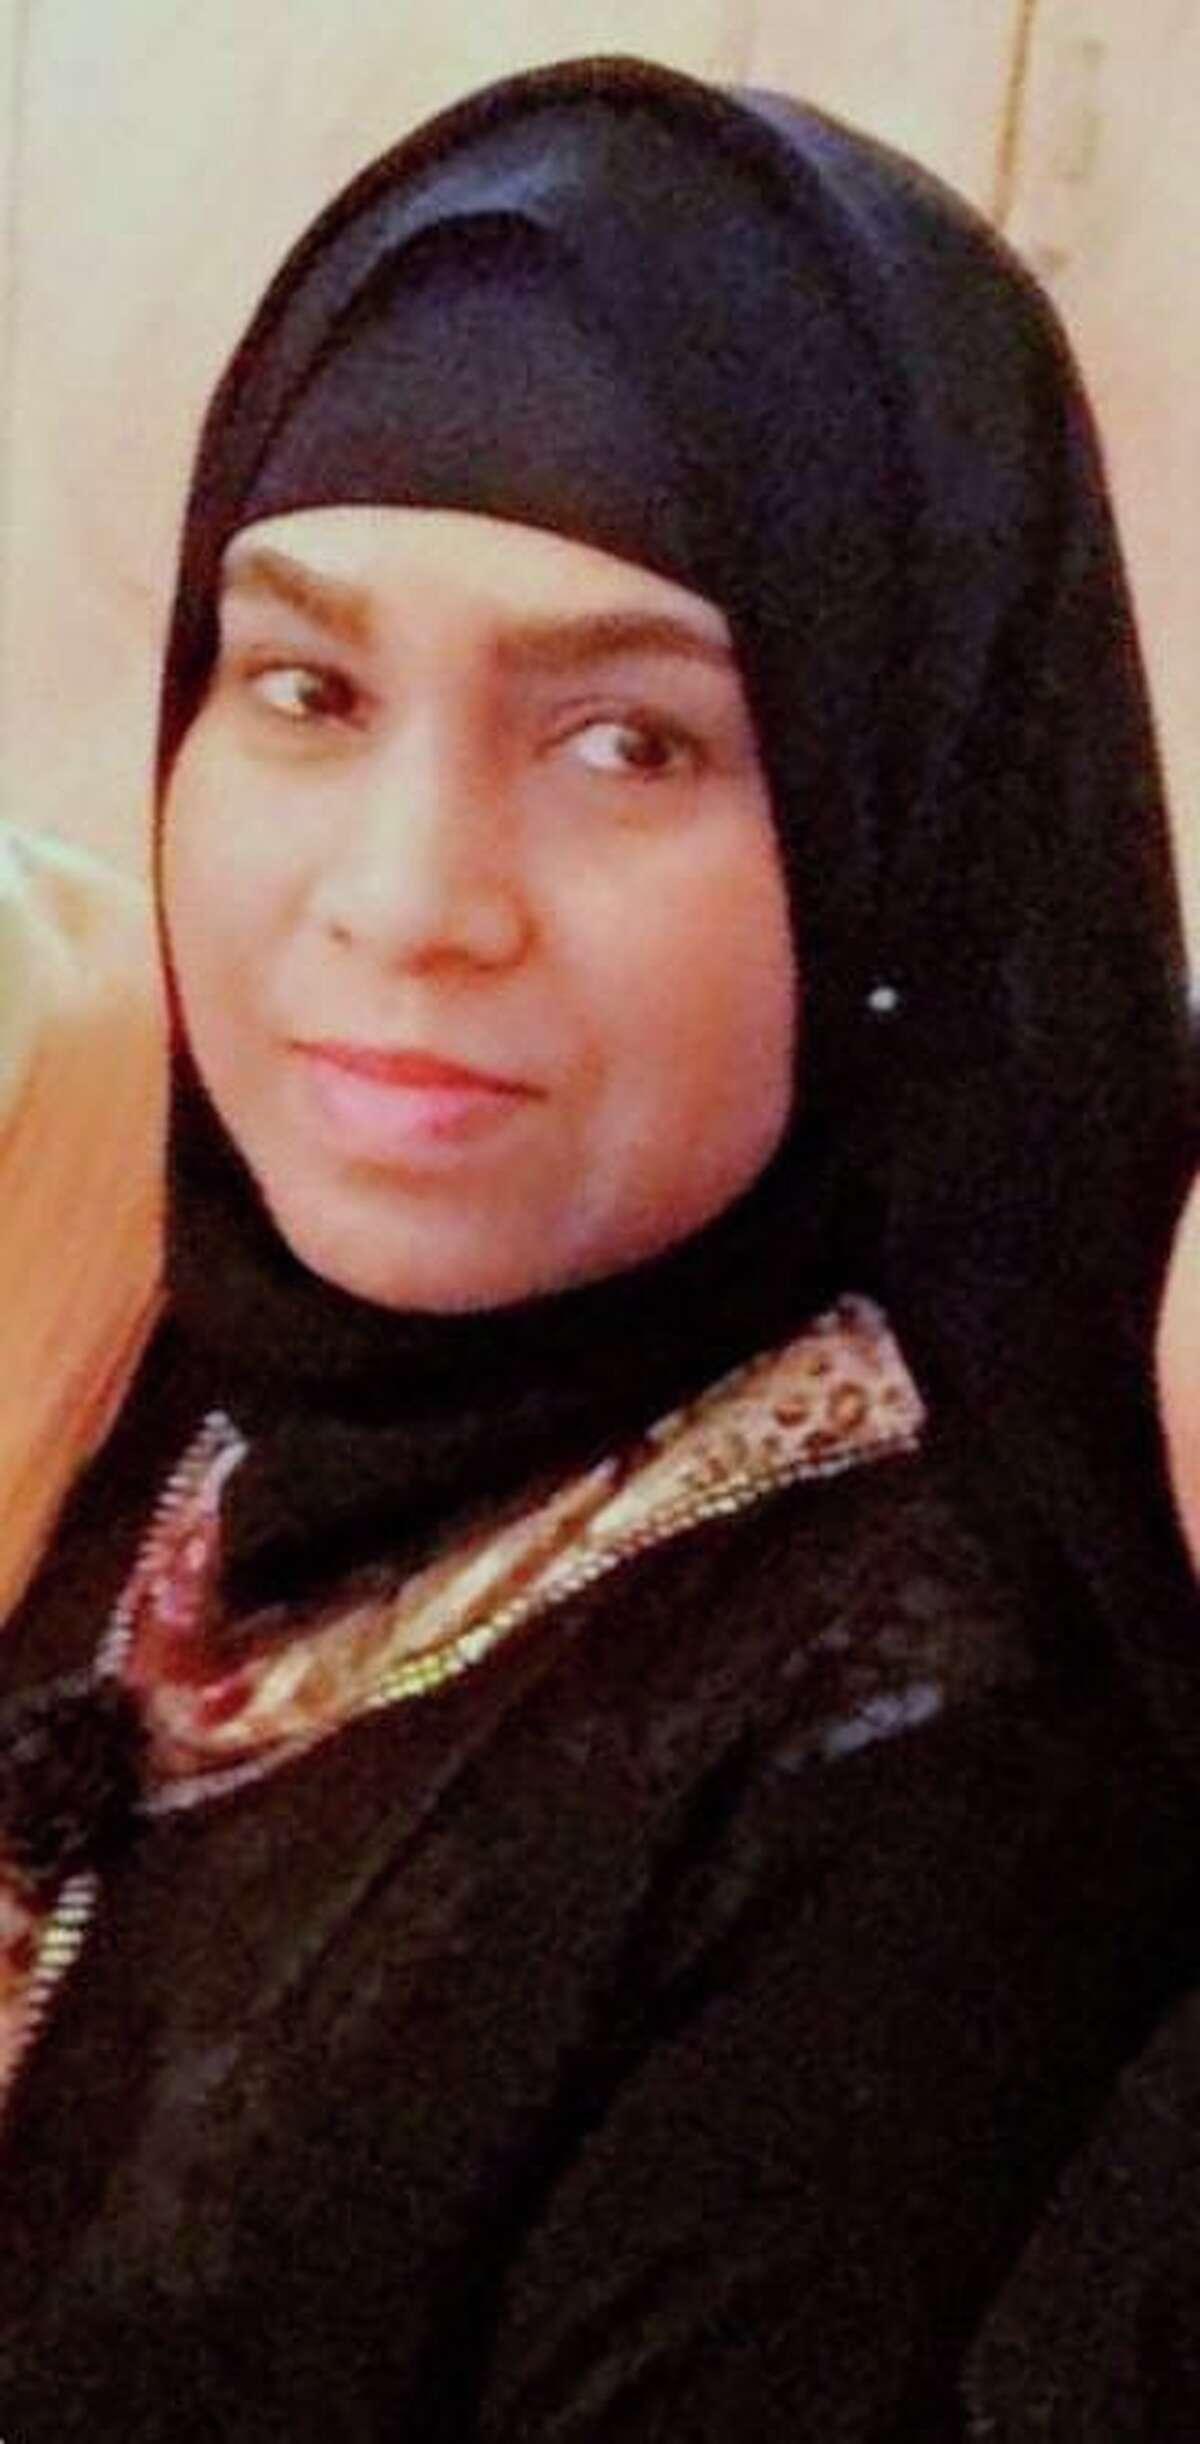 Shazeeda Khan is the director of Islamic education at Baitul Mukarram Masjid of Greater Danbury in Danbury.